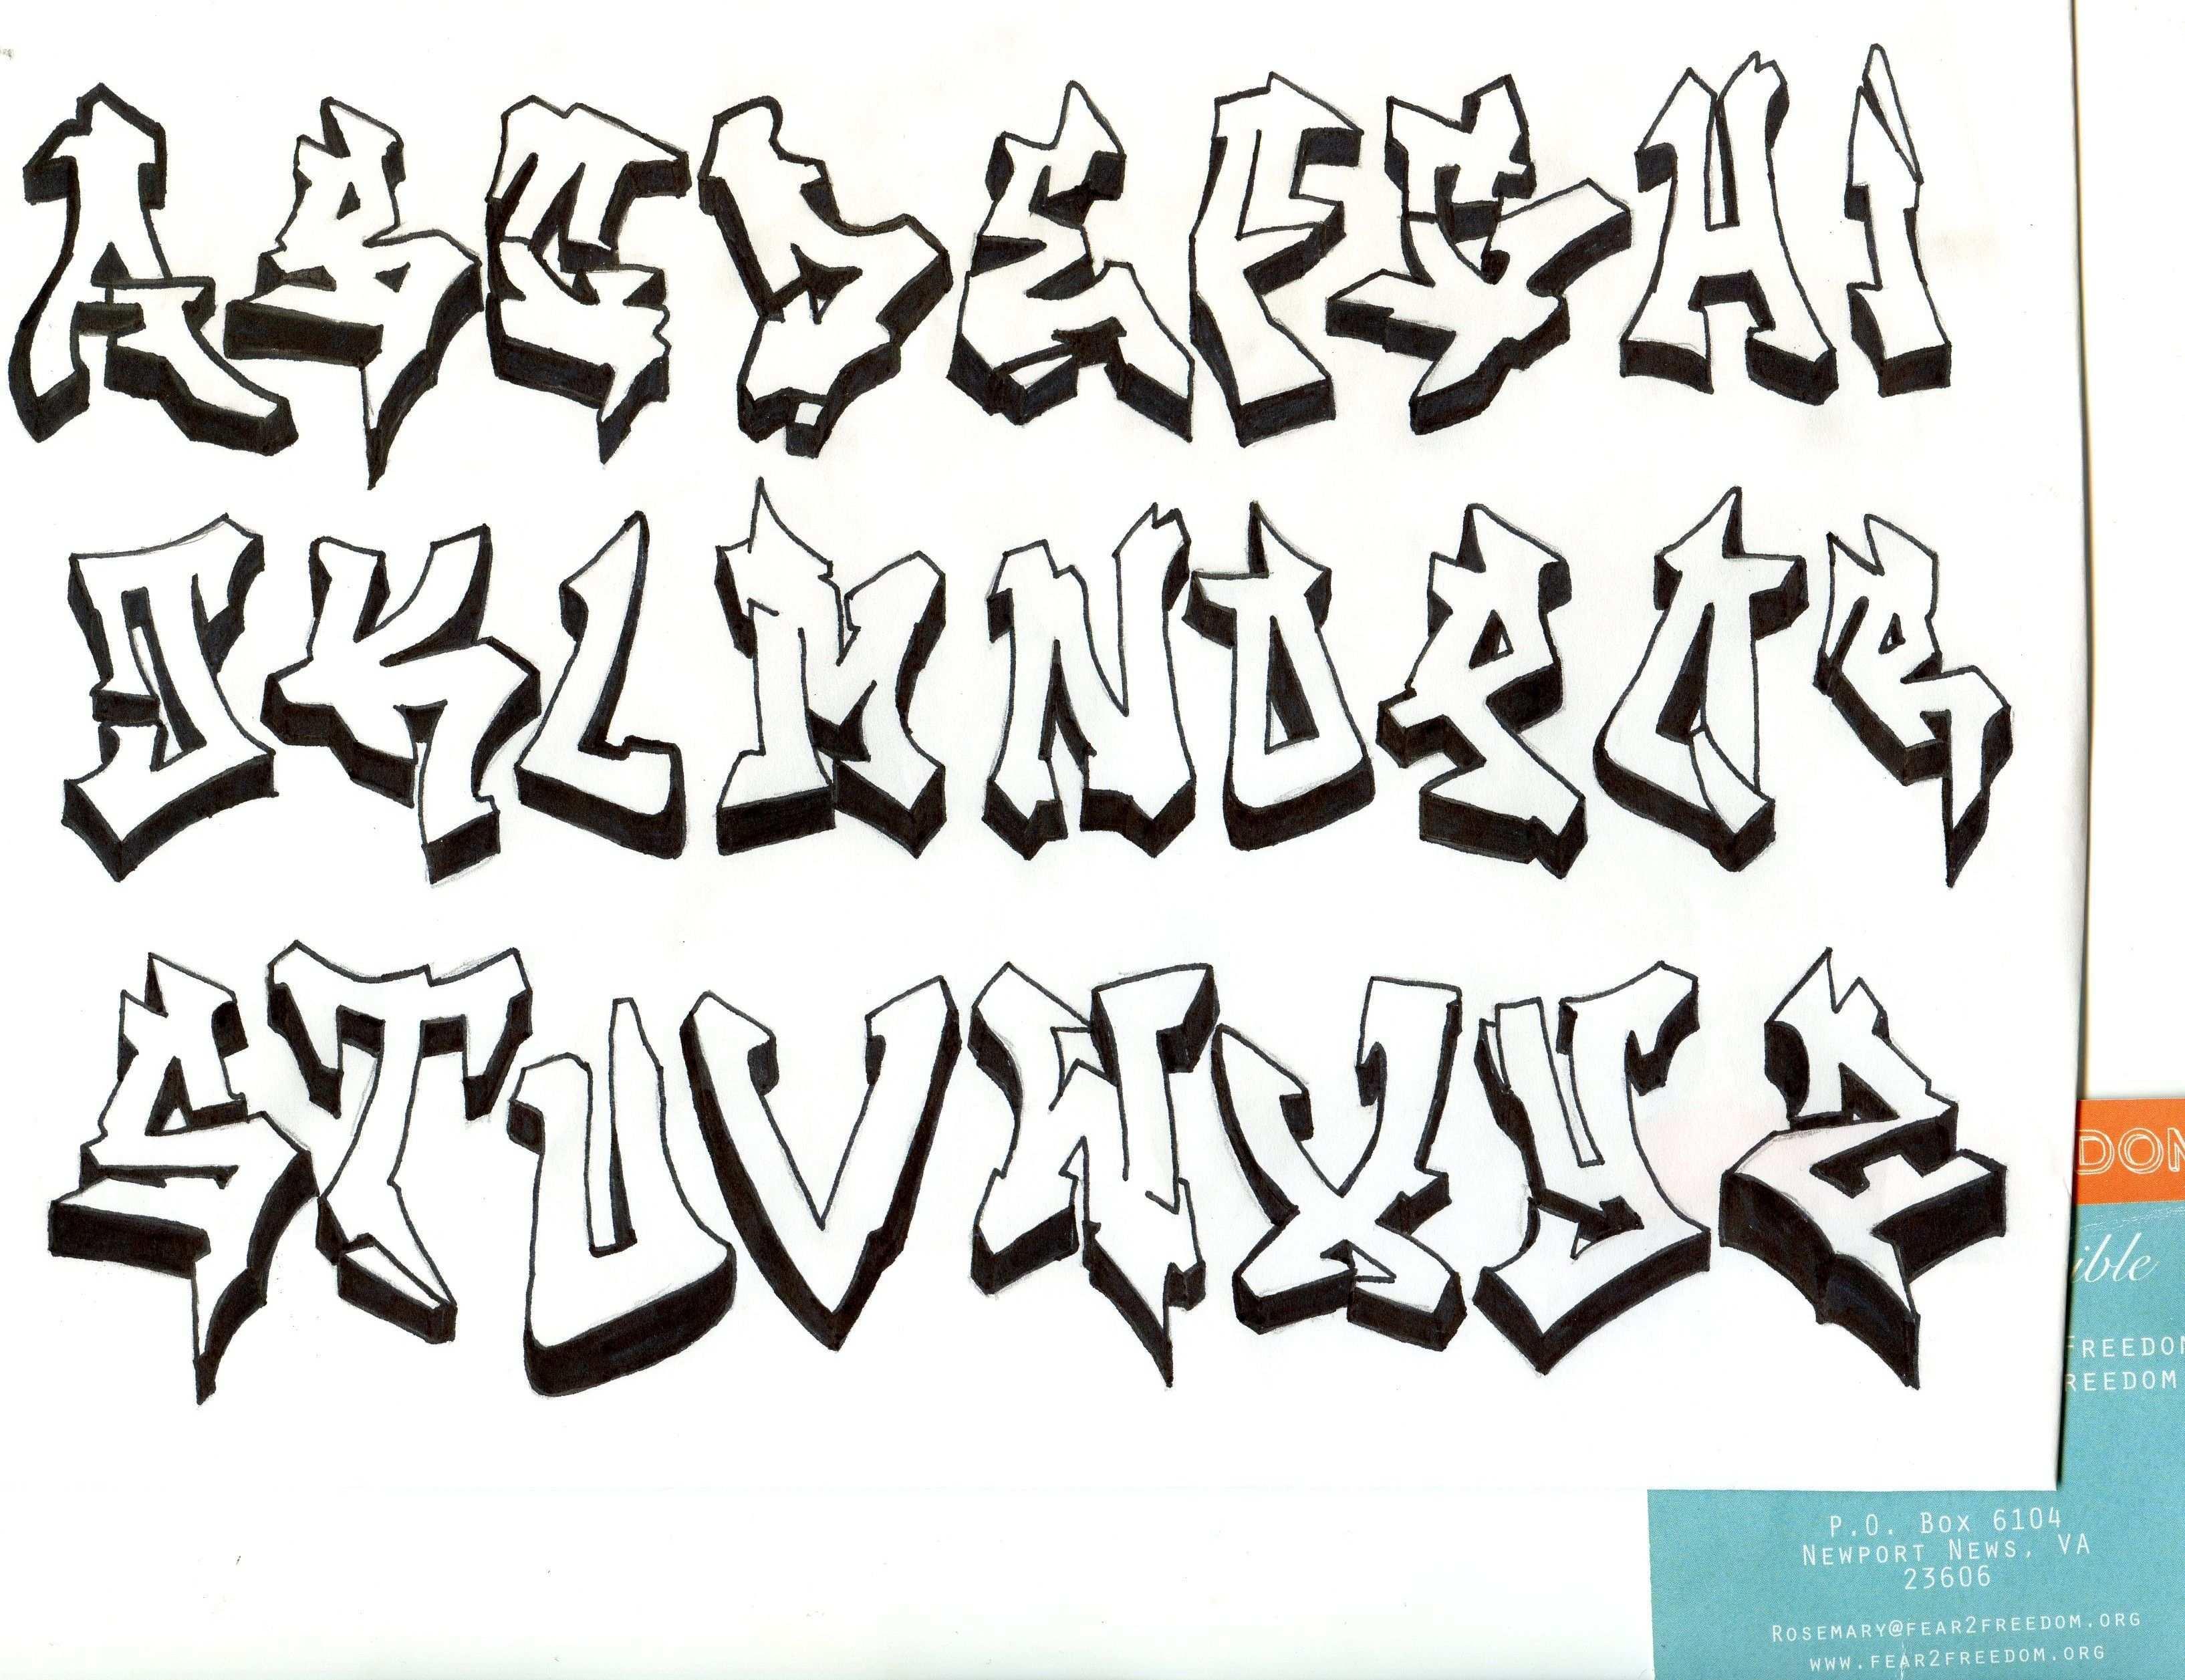 Graffiti Abc Wildstyle Graffiti Schrift Graffiti Buchstaben Graffiti Alphabet Graffiti